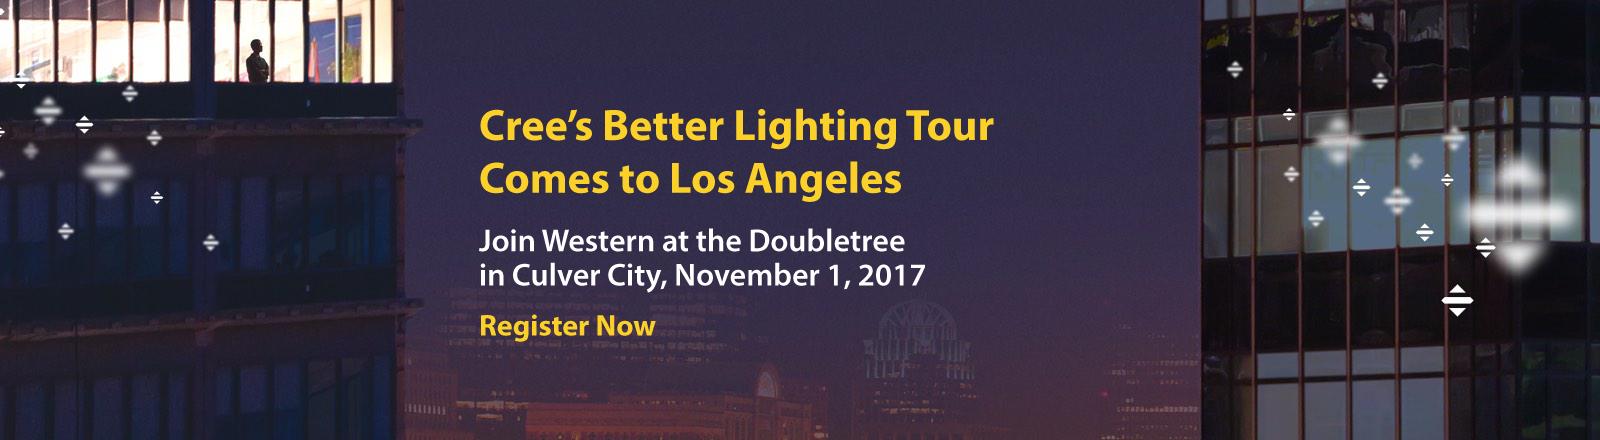 Cree-Lighting-Tour-Slider